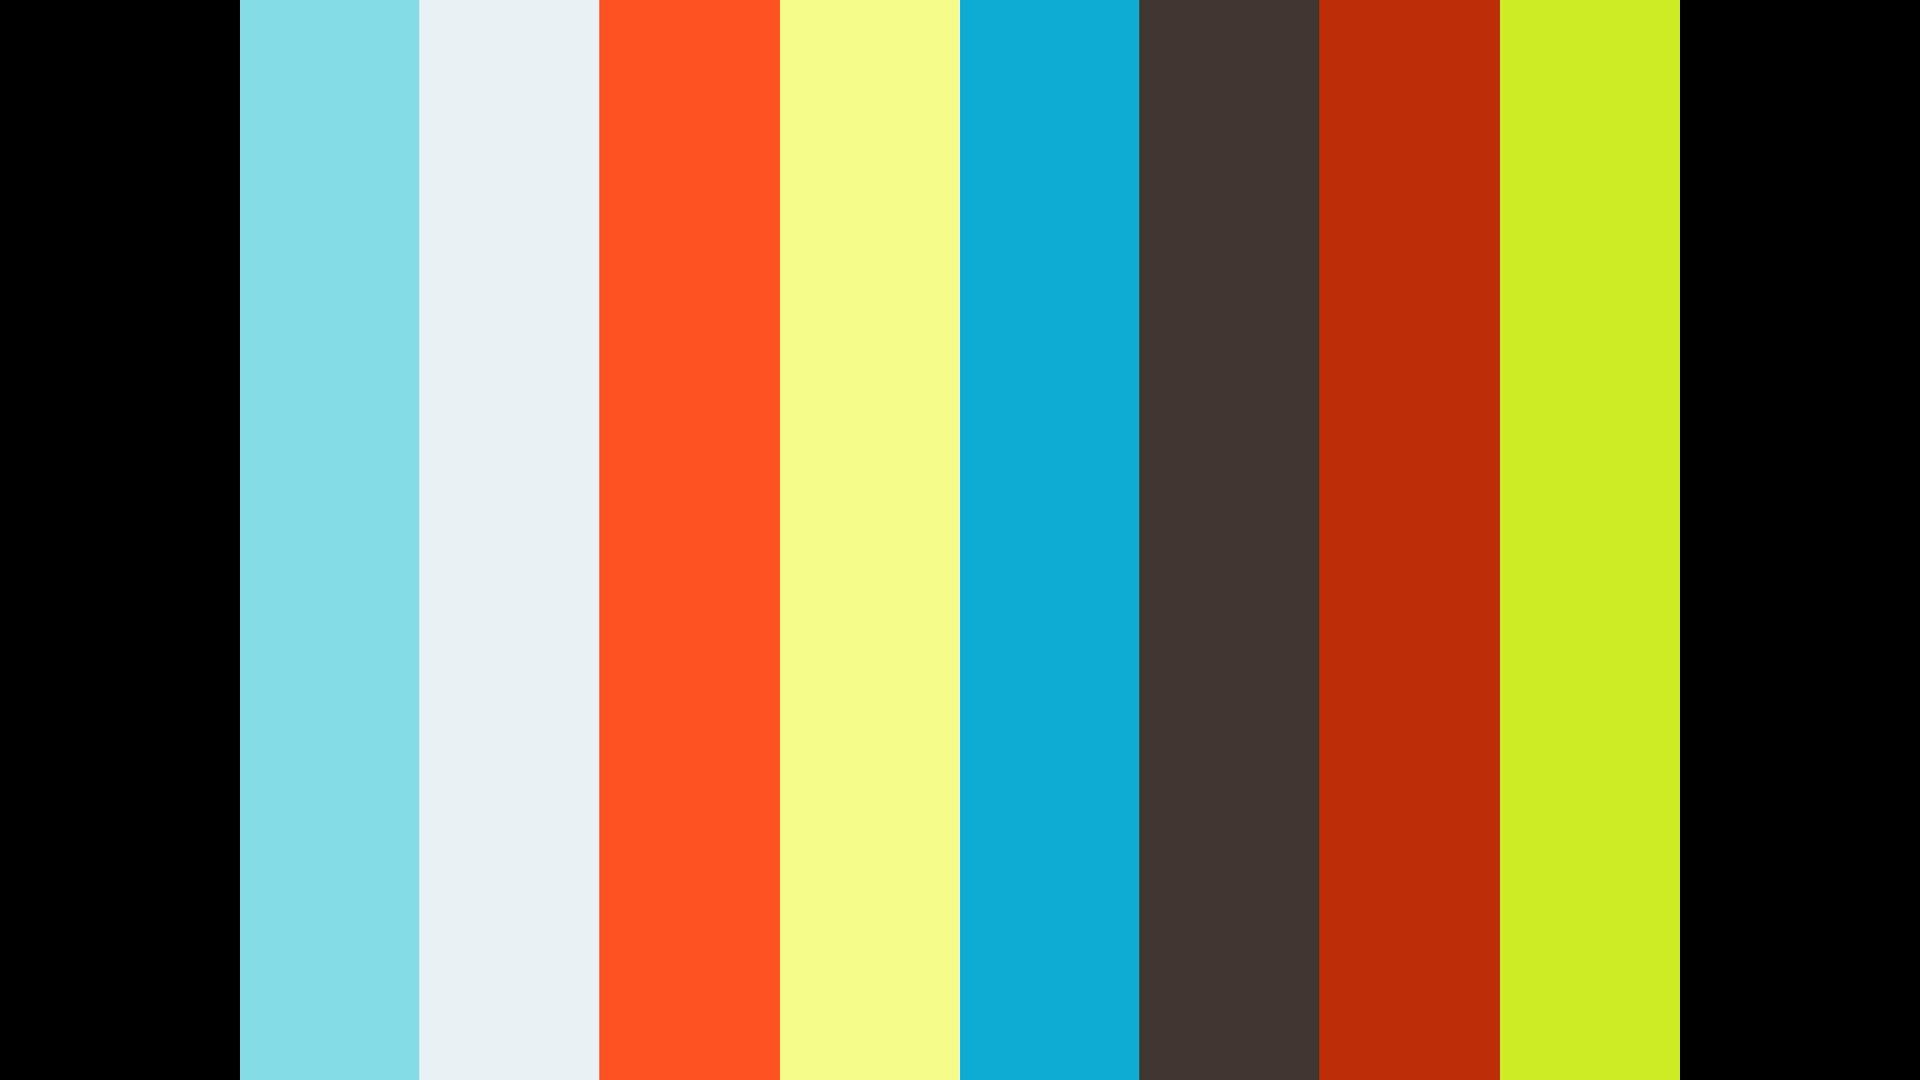 Dan Pearce - The Neon Collection v2